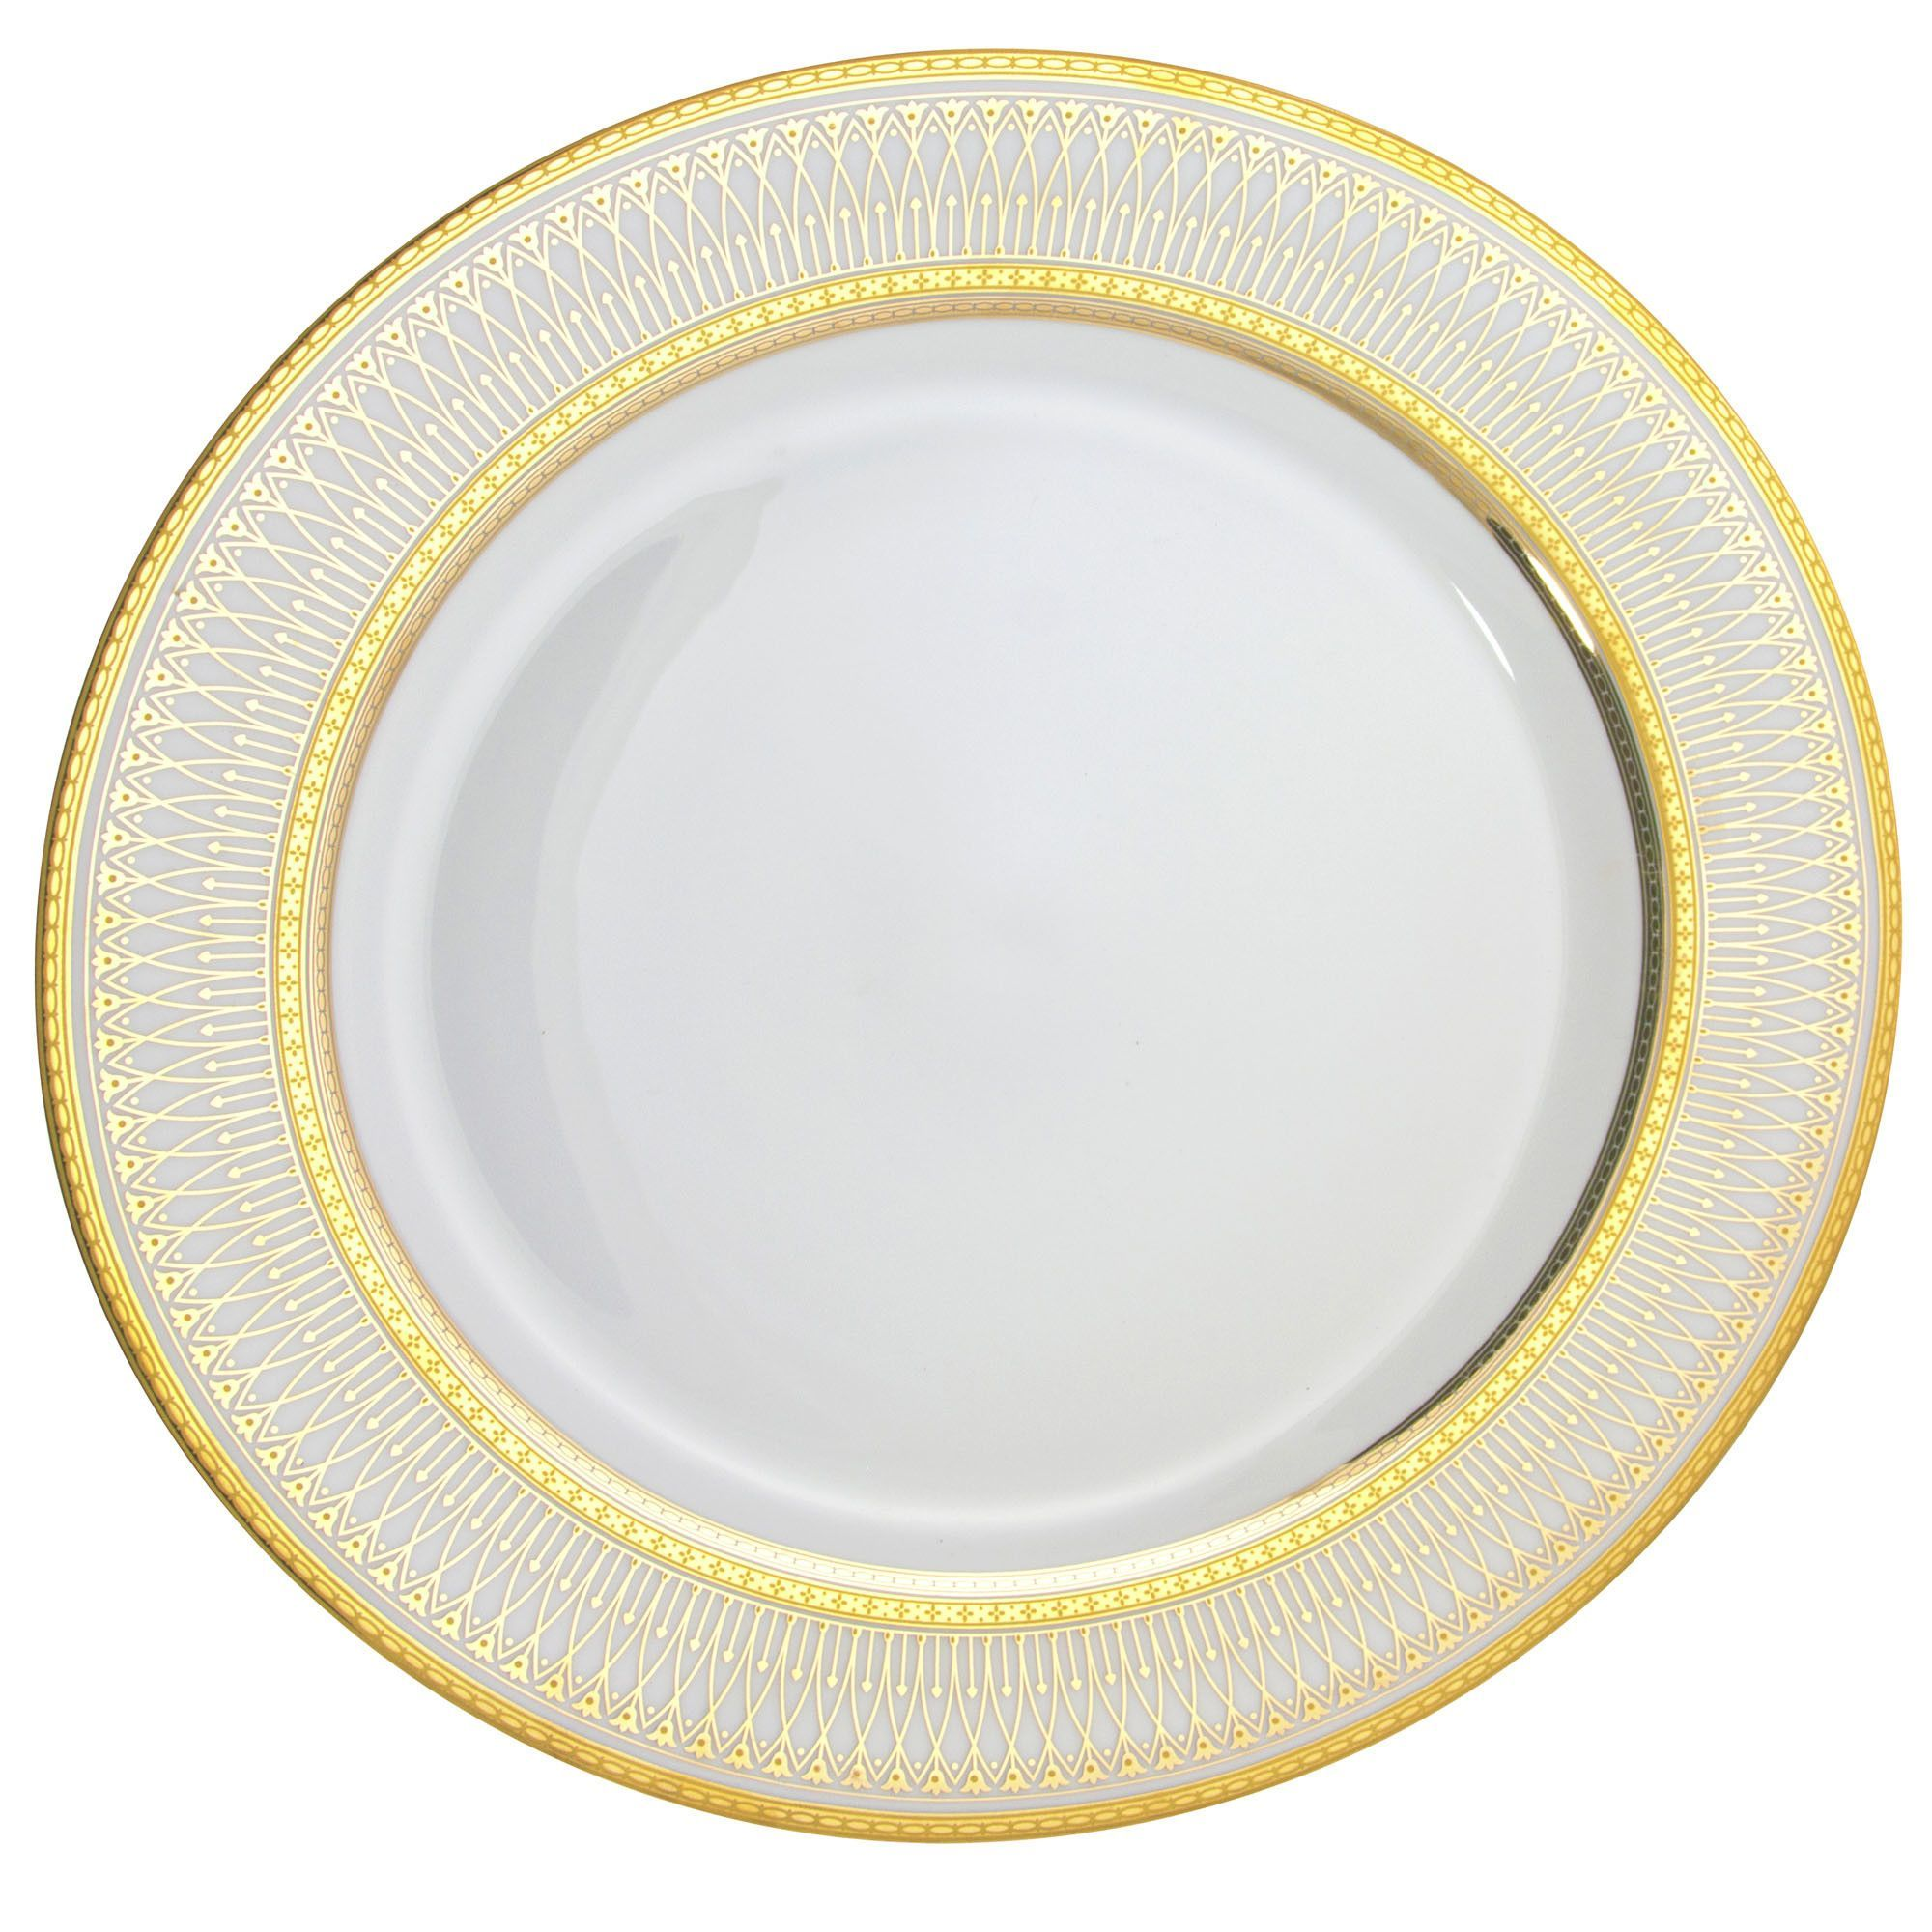 Bridgette 12 Charger Plate Charger Plates Plates Plate Sets